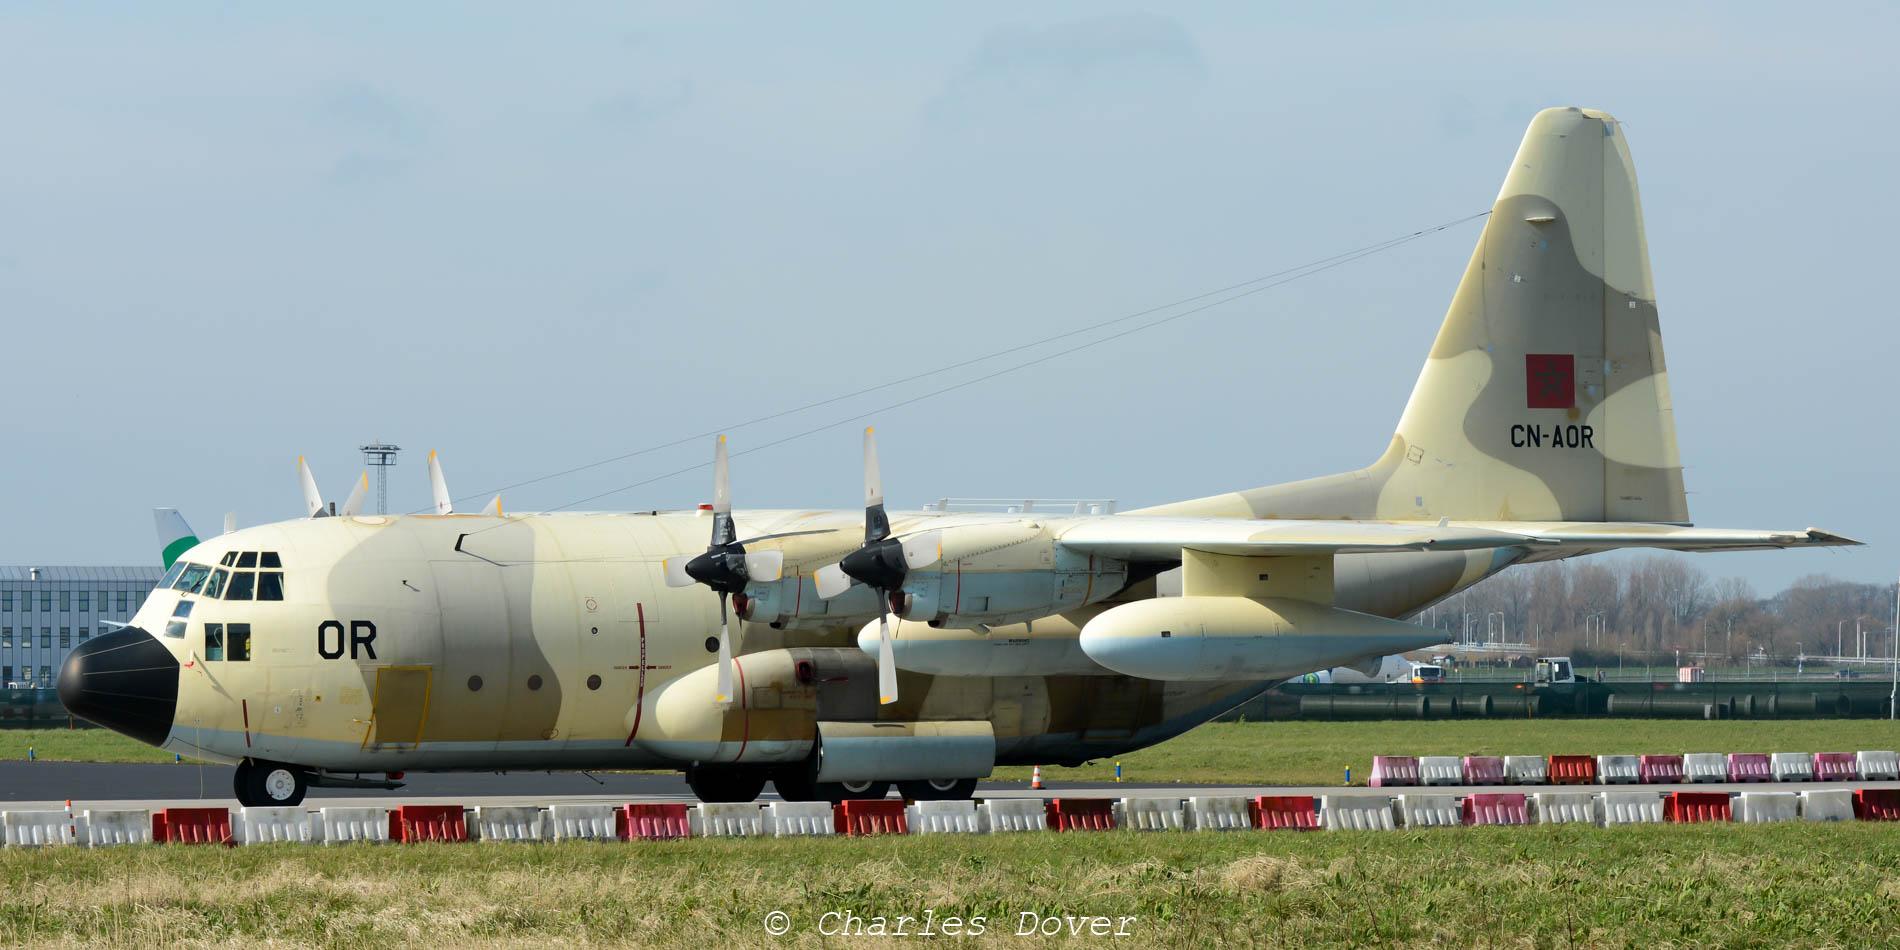 FRA: Photos d'avions de transport - Page 27 25987412561_3cf6938959_o